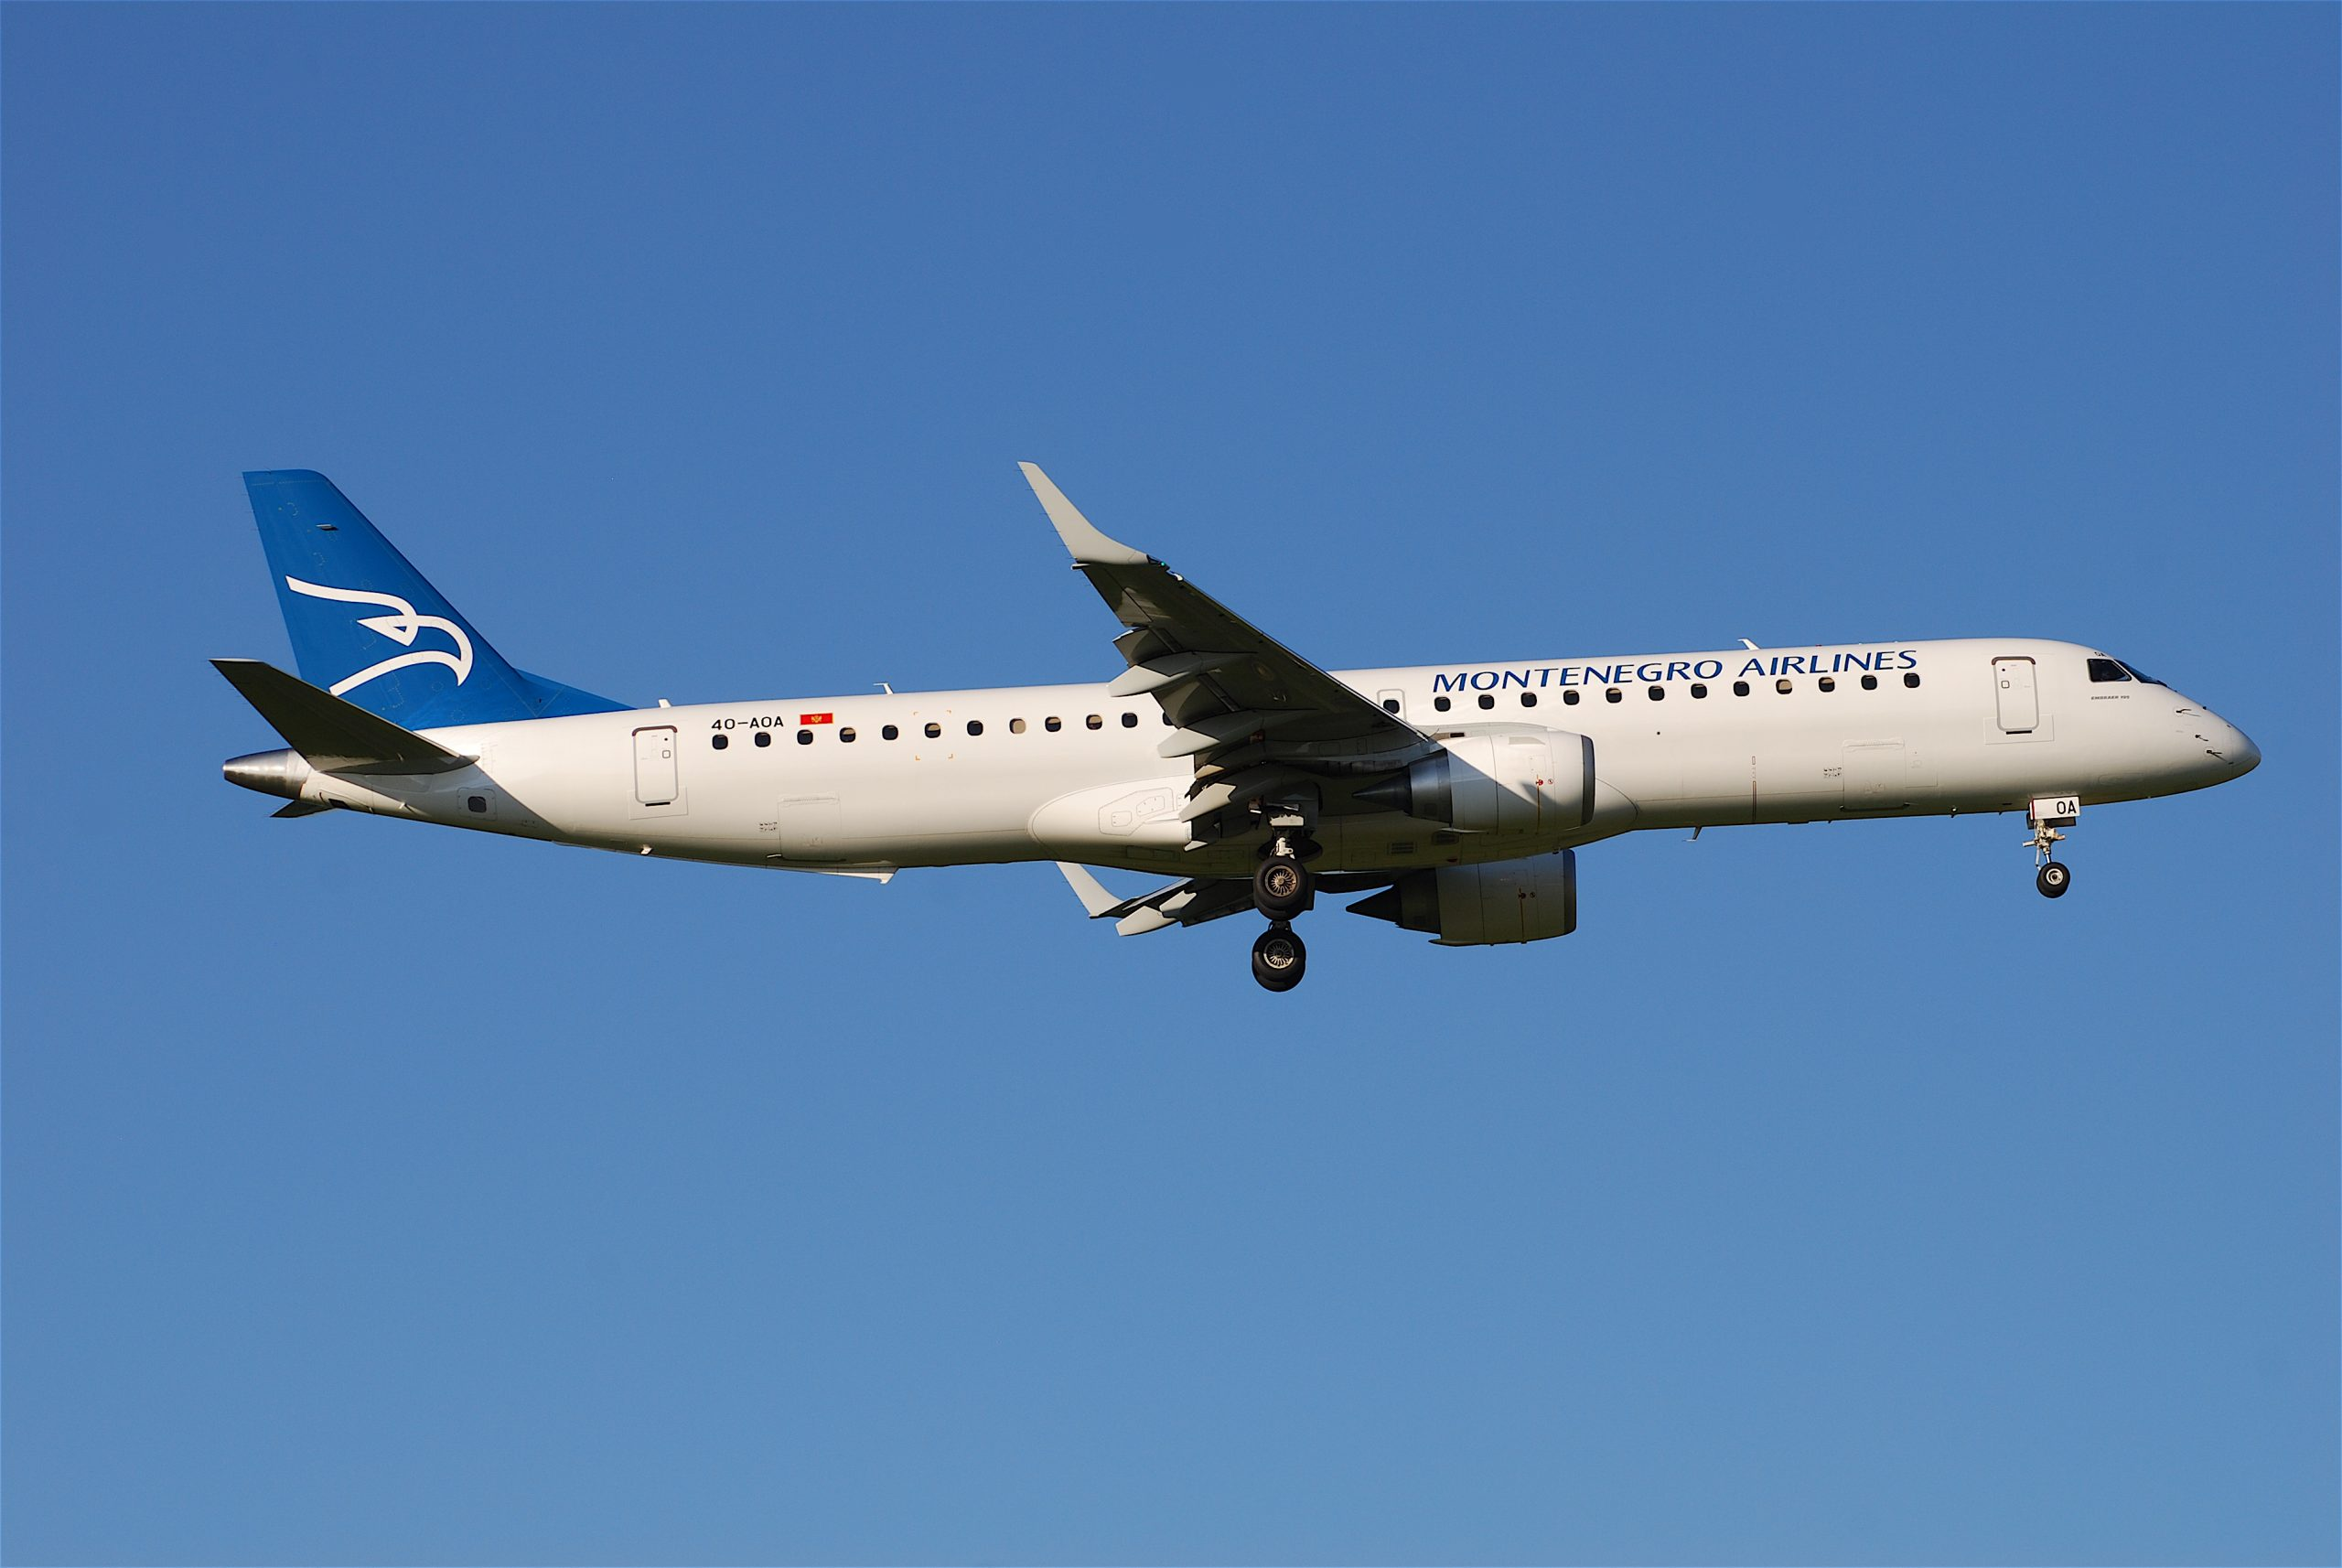 En Embraer E195 fra det tidligere Montenegro Airlines. Foto: Aero Icarus, CC 2.0